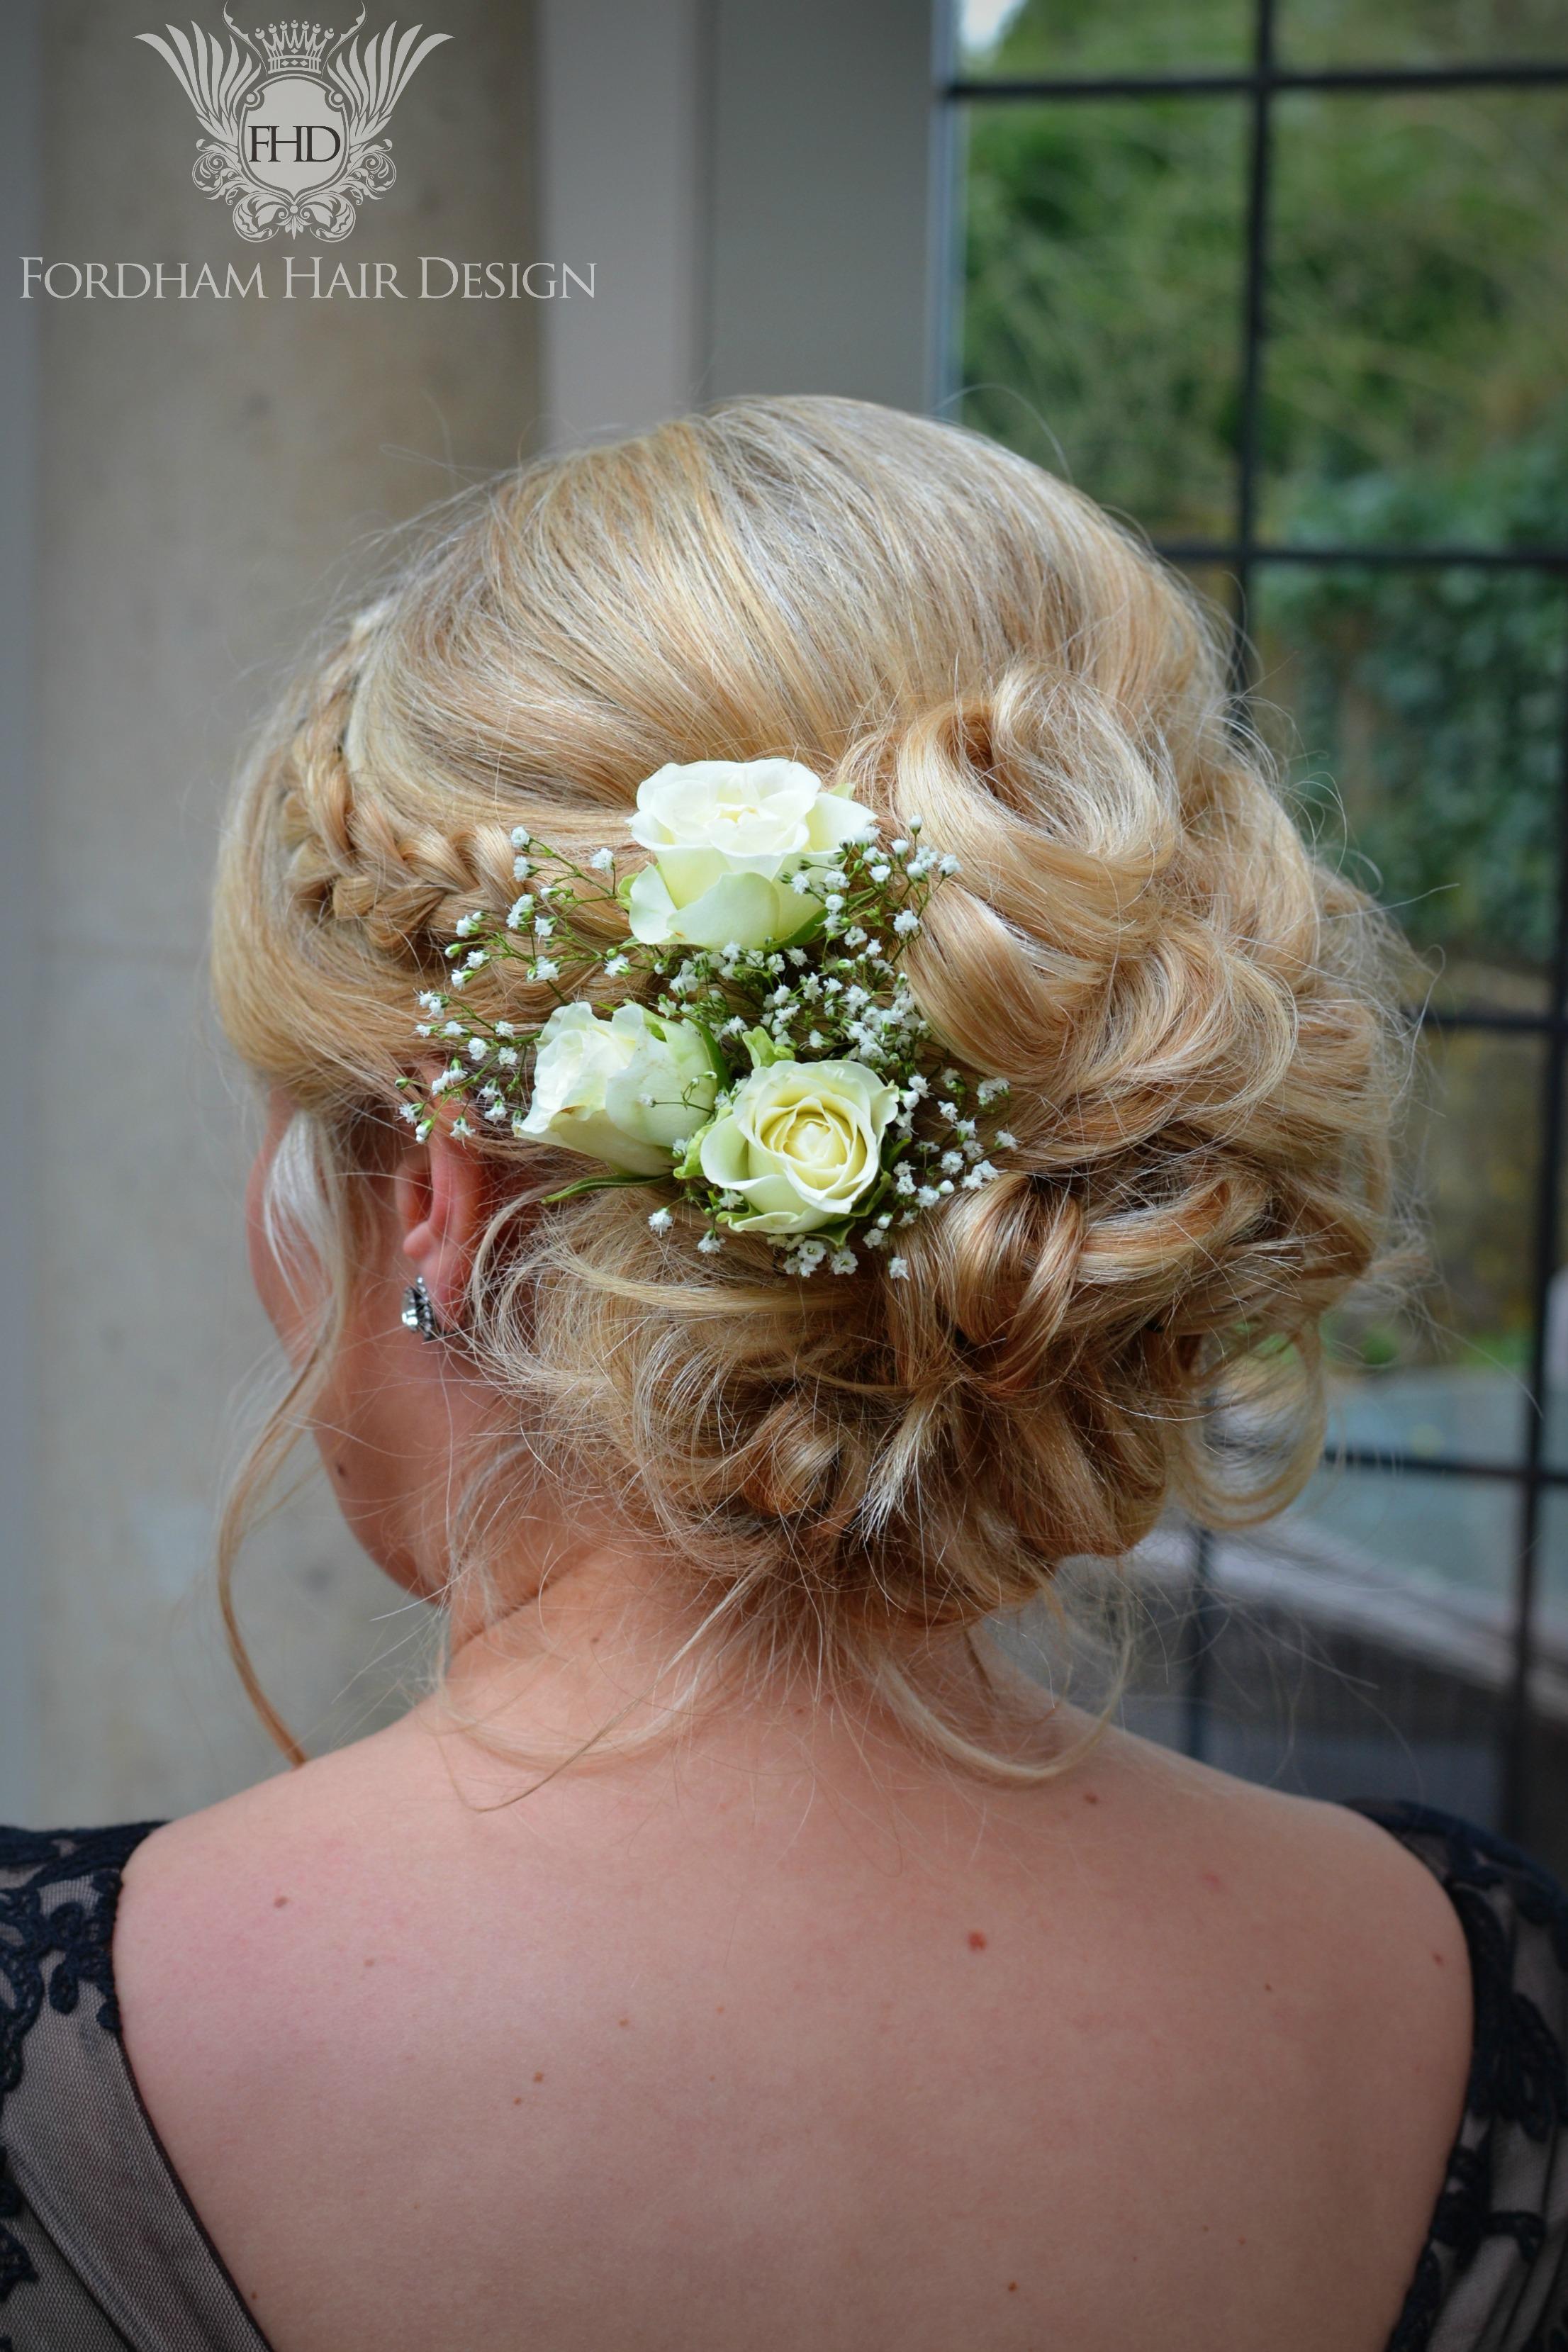 Barnsley House Wedding Hair